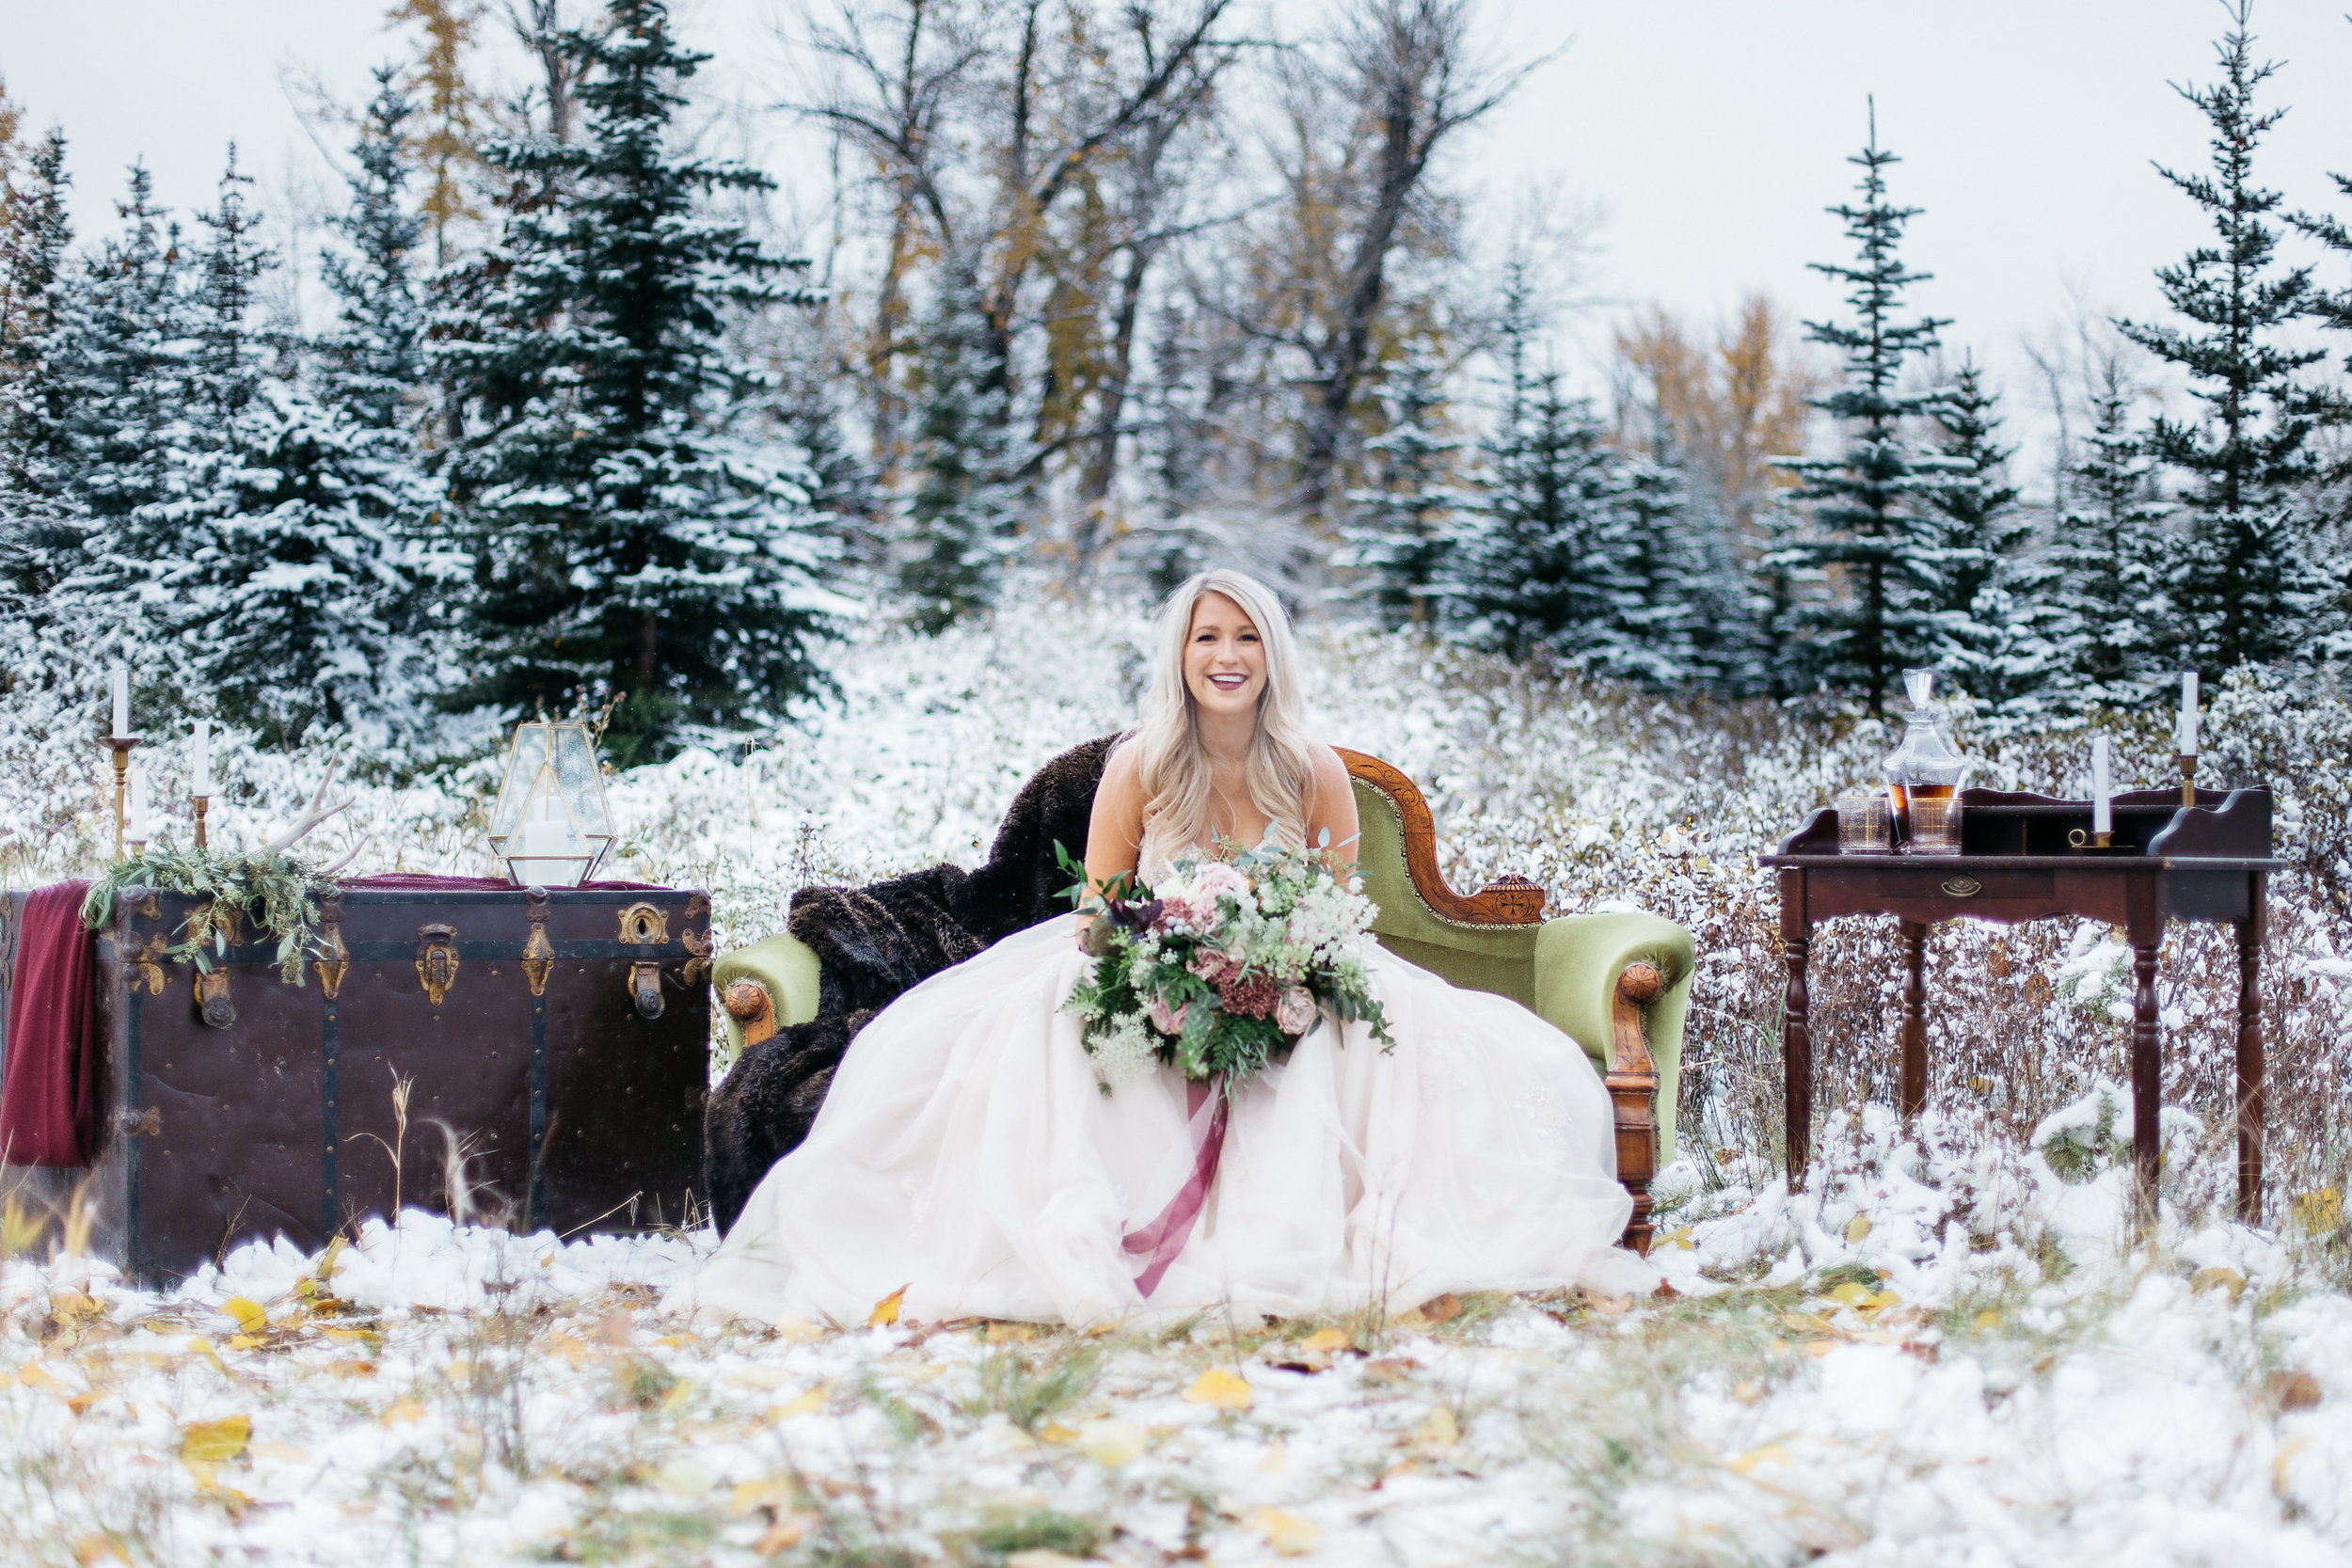 winter wedding bride with elegant bouquet of flowers